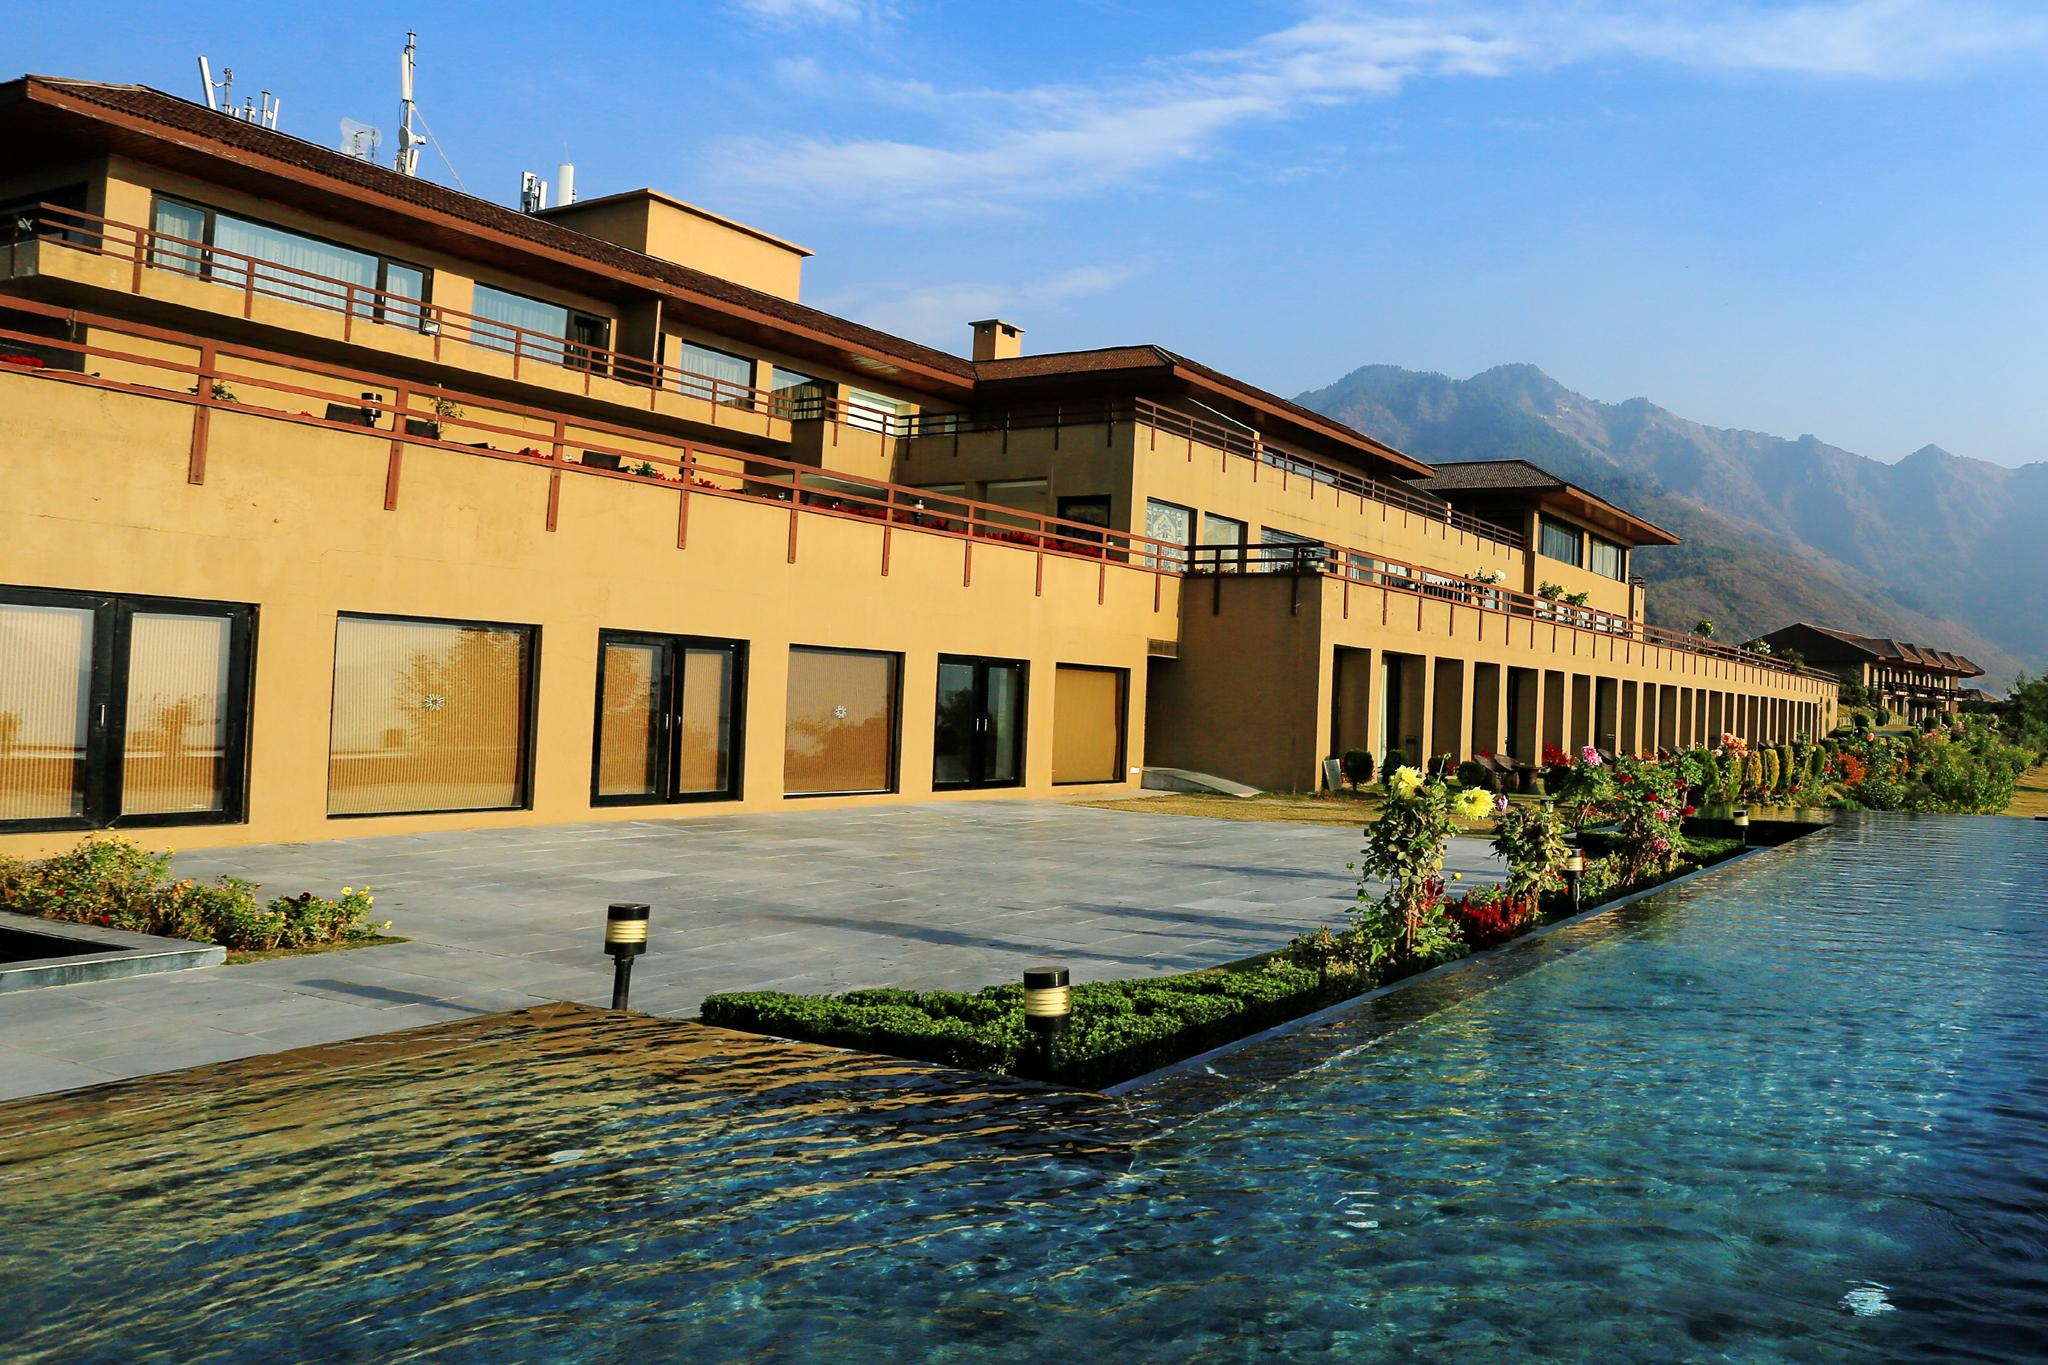 Enjoy the Backwaters on Shikara - Bachelorette trip Destinations in India